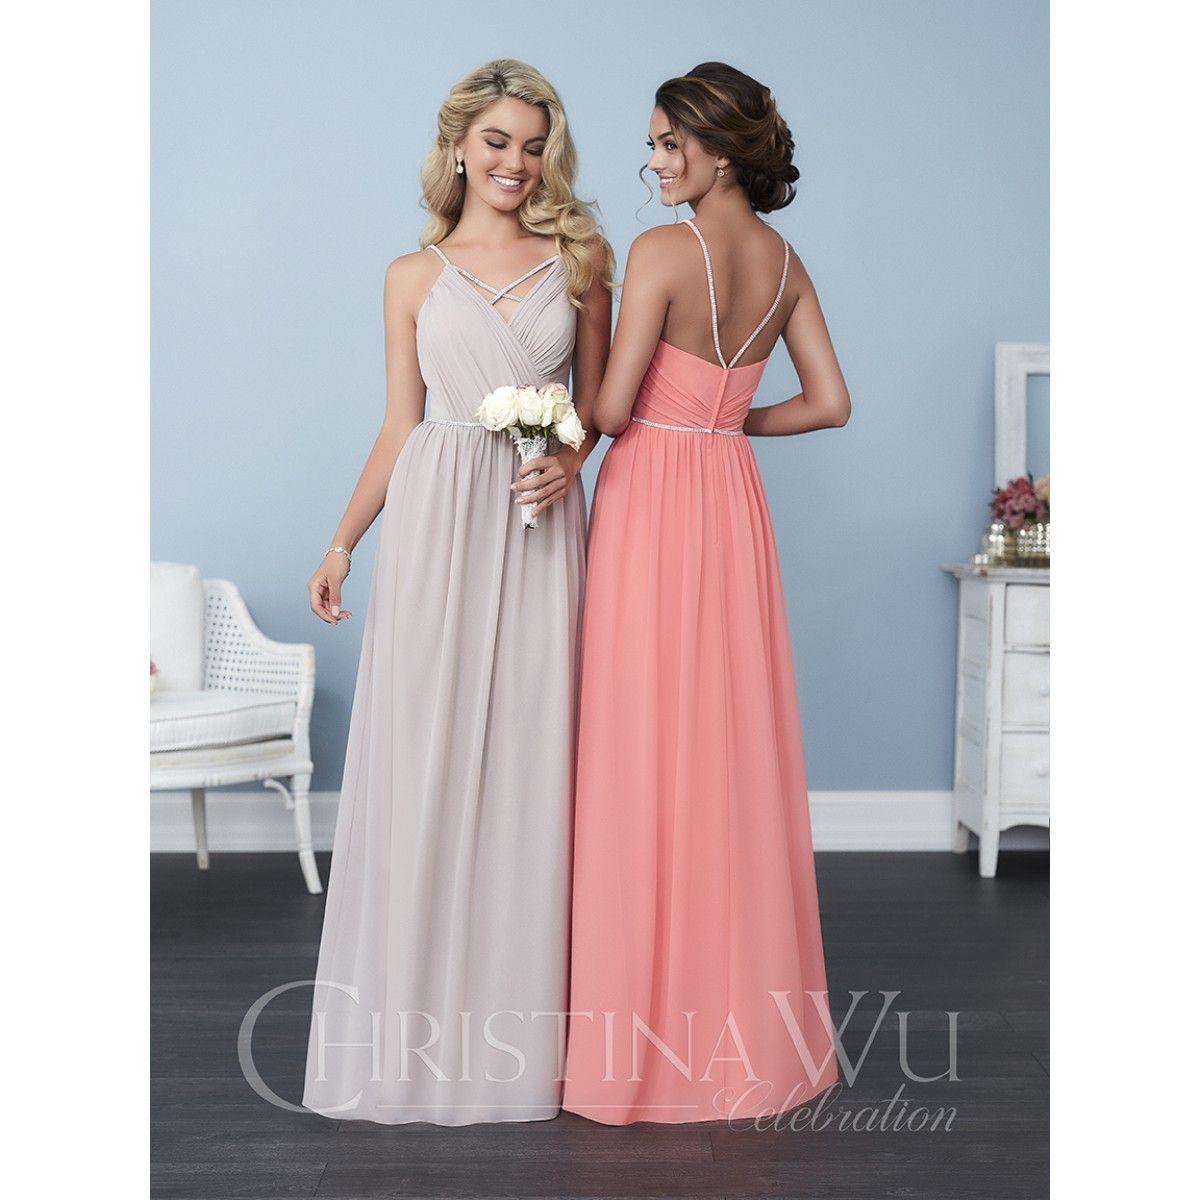 Bridesmaid Dress Available at Ella Park Bridal | Newburgh, IN ...